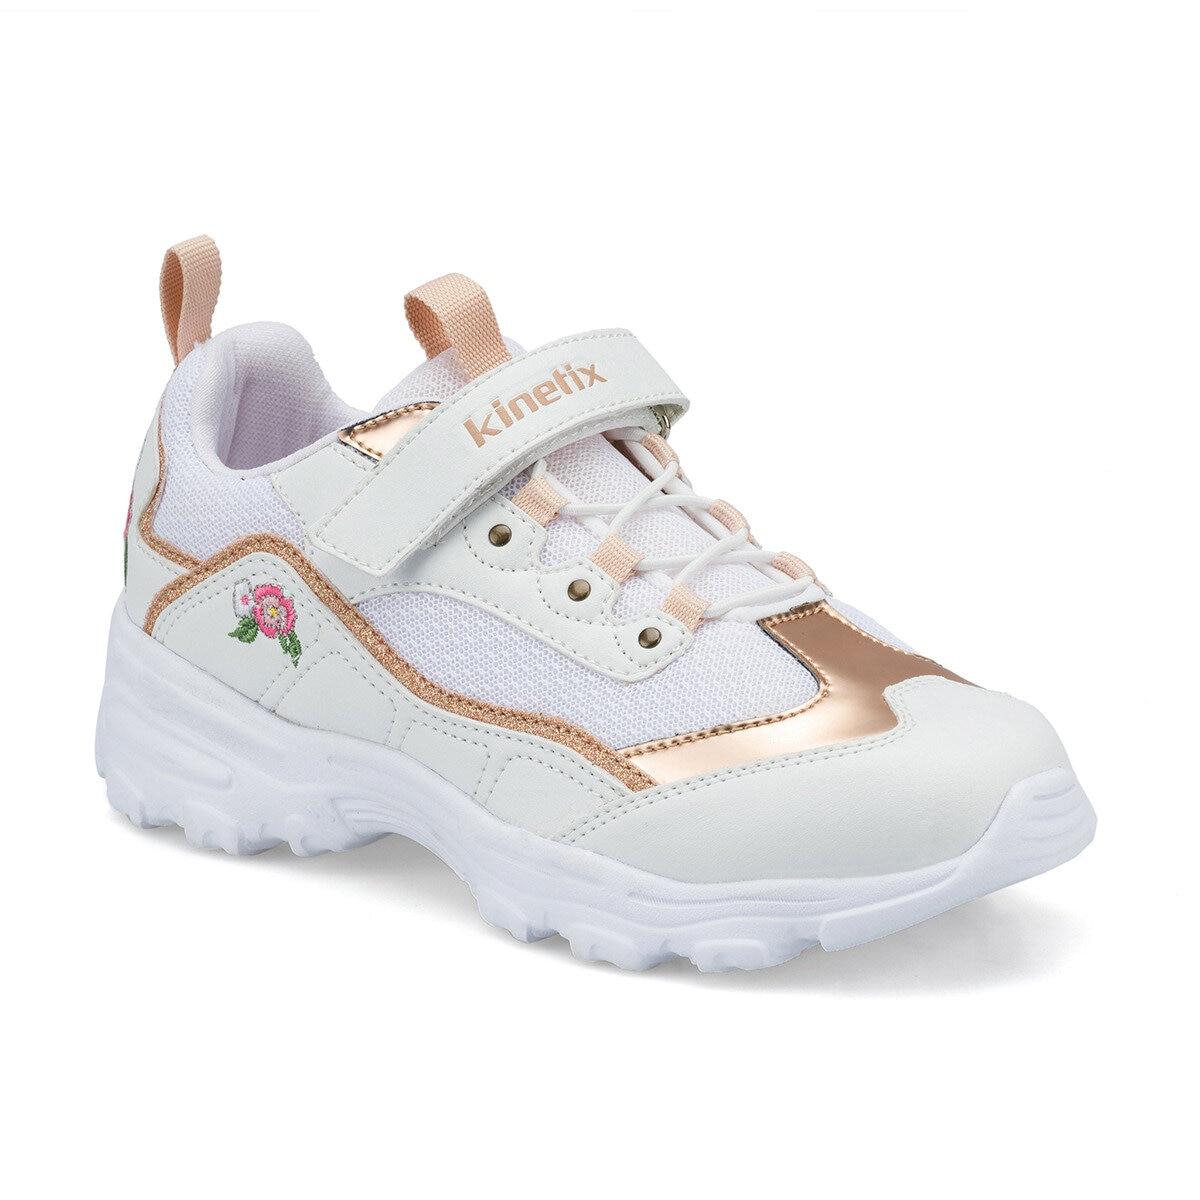 FLO HARMONI blanco mujer zapatilla deportiva para niños zapatos KINETIX